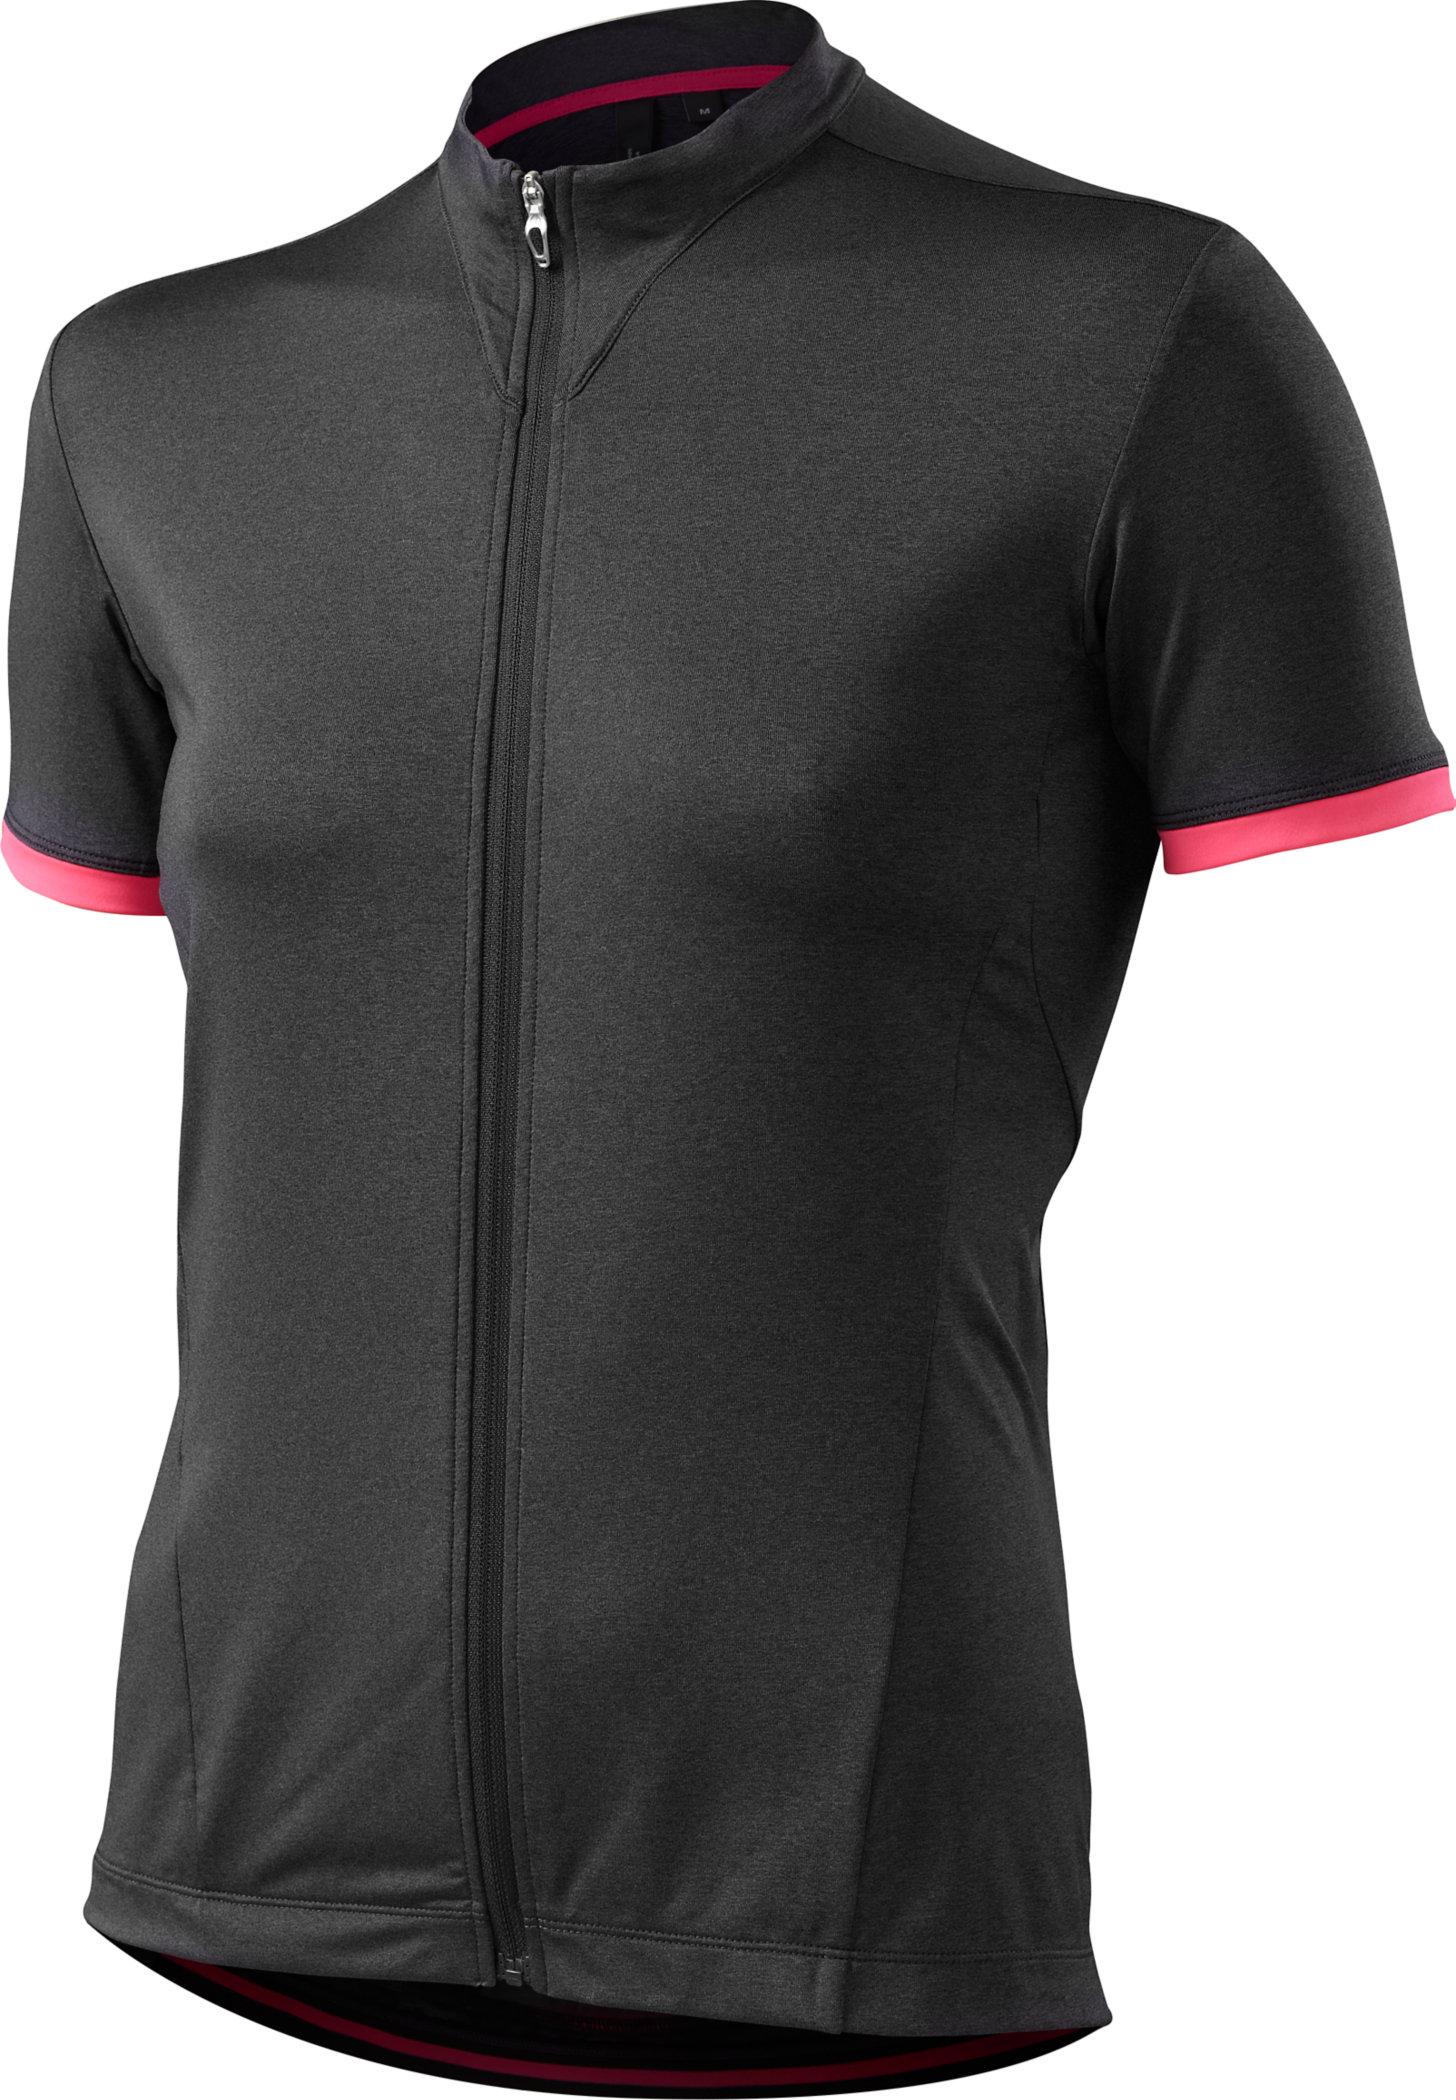 Specialized Women´s RBX Comp Jersey Carbon Heather/Neon Pink Medium - Alpha Bikes